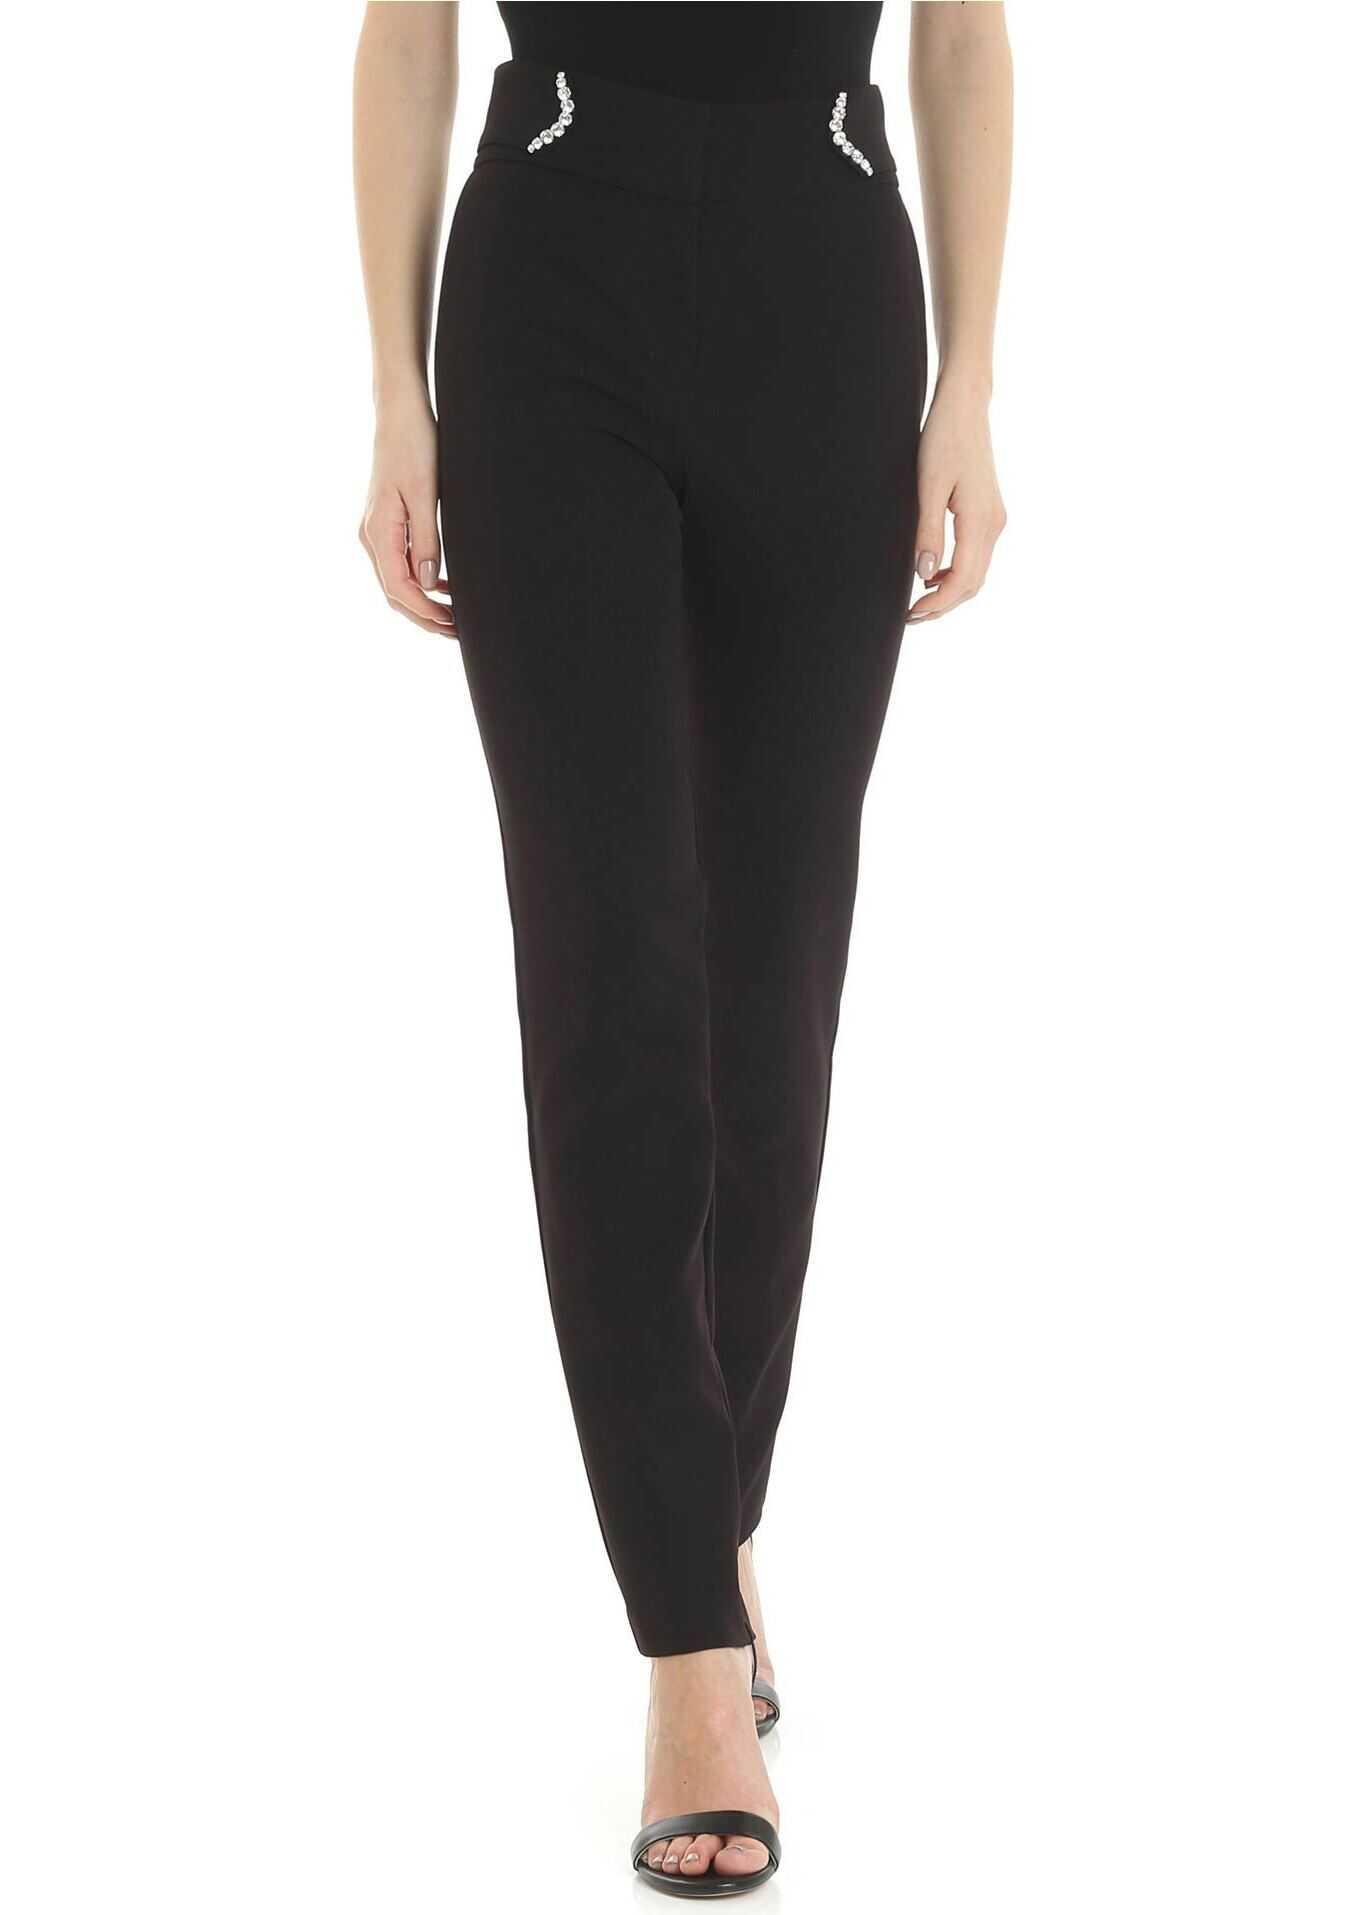 Blugirl Black Trousers With Jewel Embellishment Black